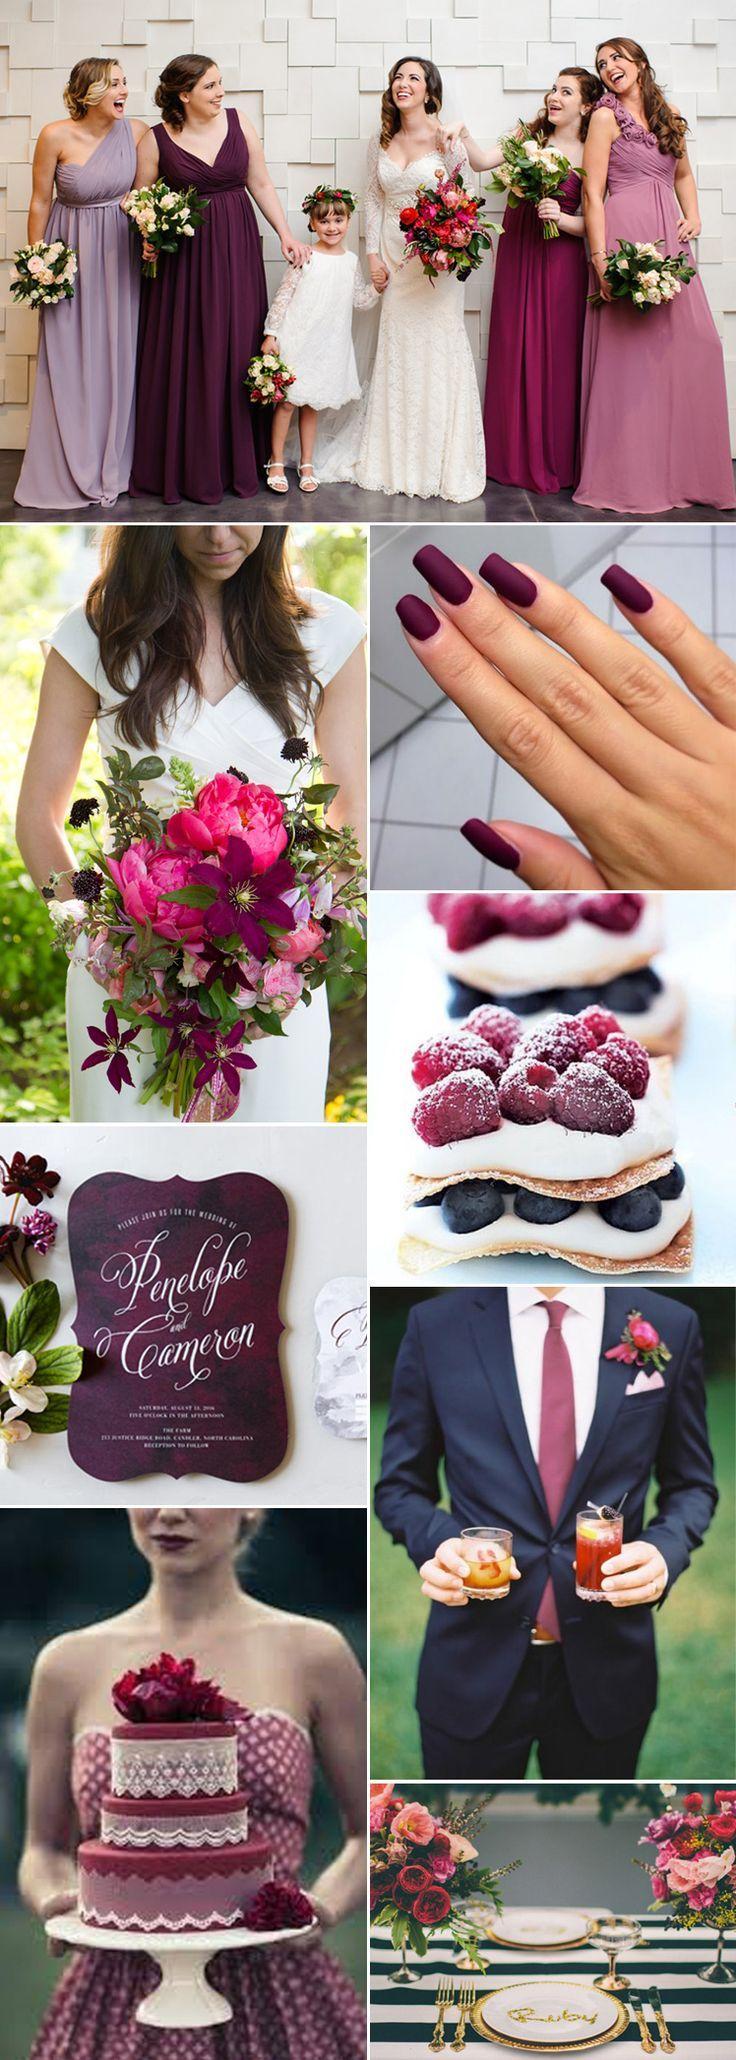 Stunning & Stylish Berry Wedding Inspiration | Sophisticated ...